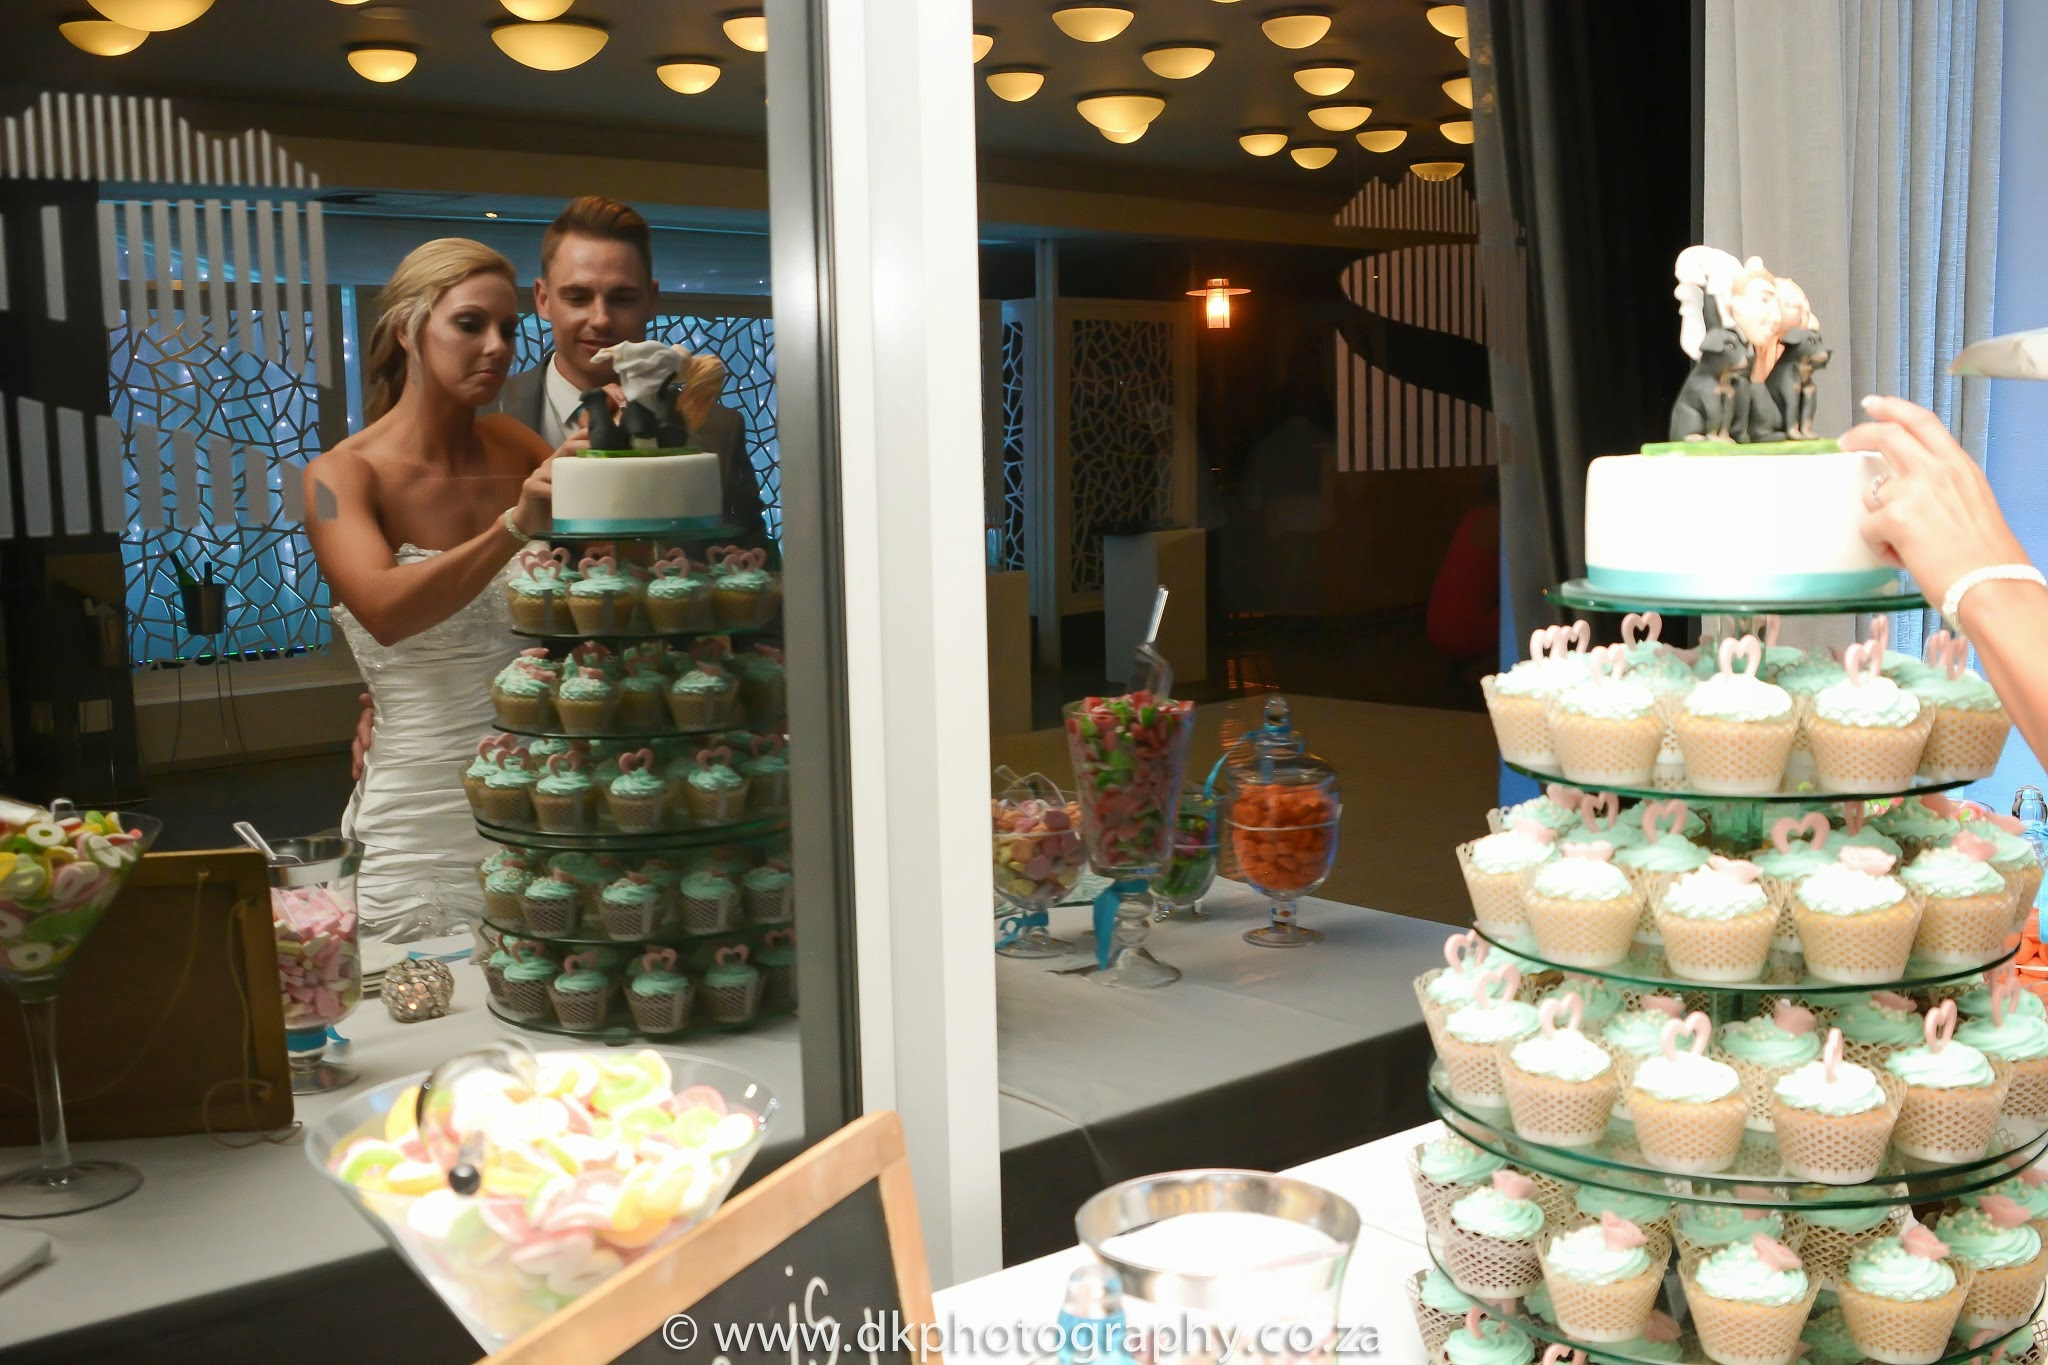 DK Photography CCD_7656 Wynand & Megan's Wedding in Lagoon Beach Hotel  Cape Town Wedding photographer